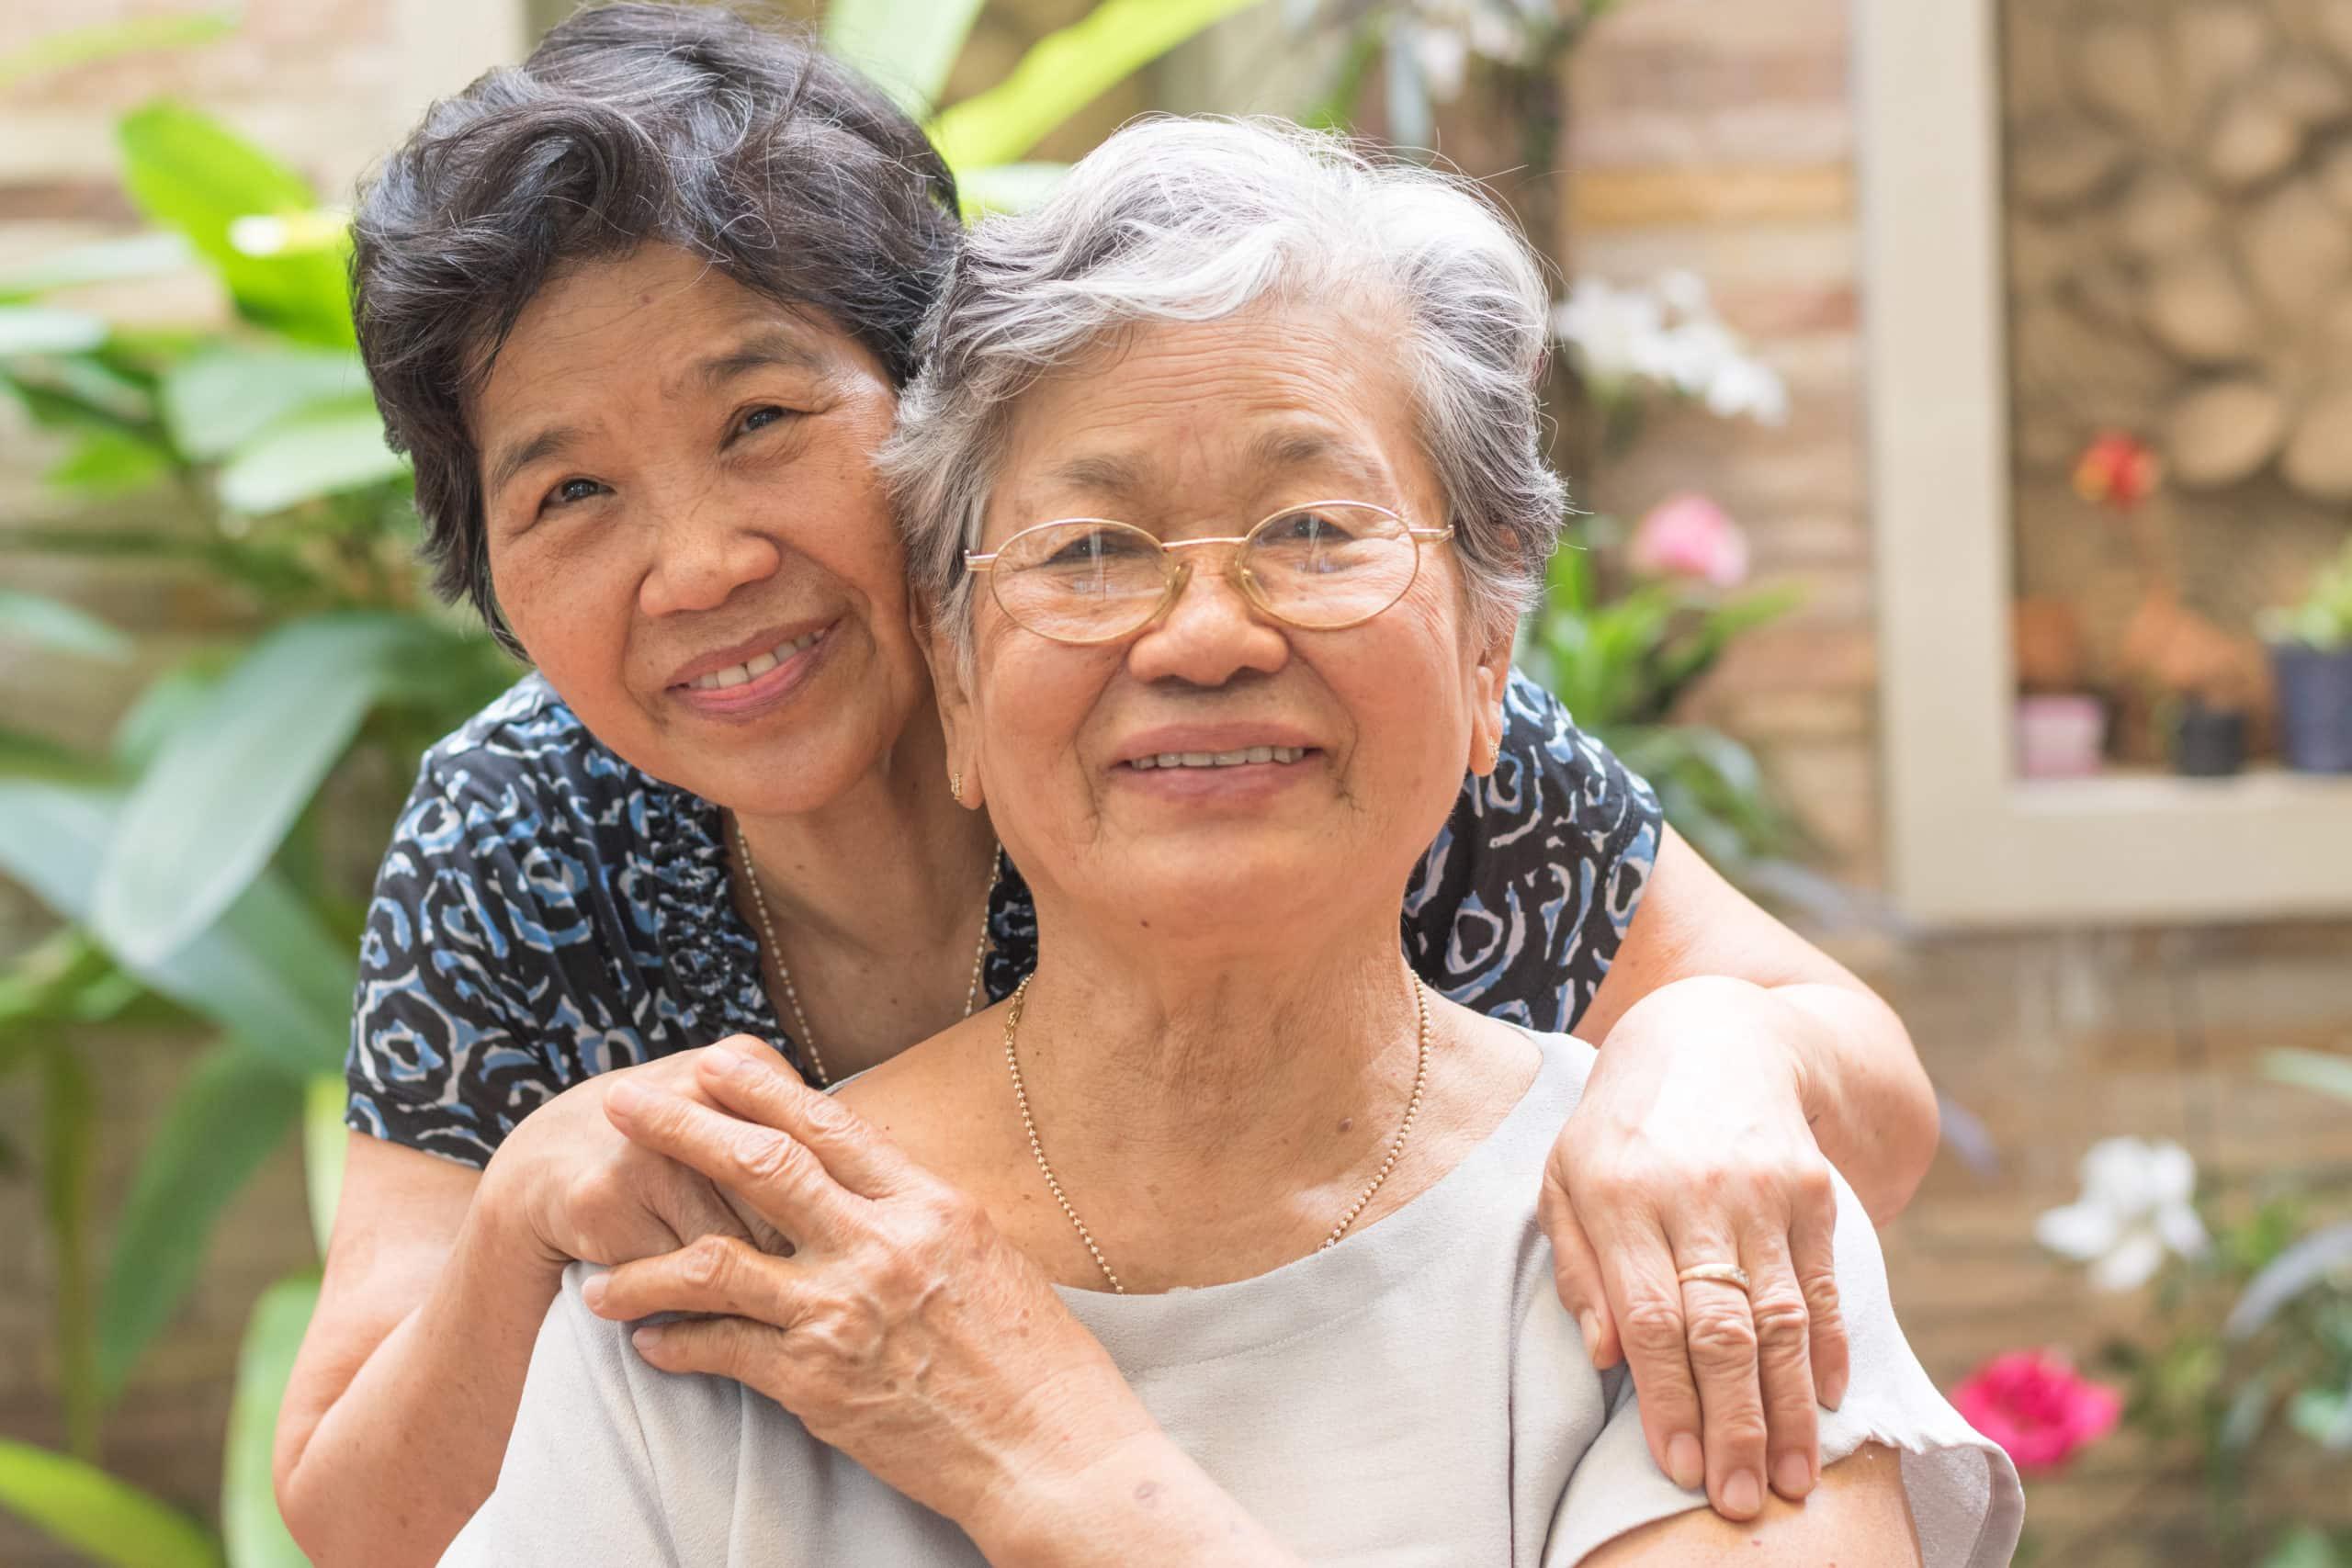 The Schmieding Home Caregiver Training Program, a program of the University of Arkansas for Medical Sciences (UAMS), is offering free Respite Volunteer Training on July 29-30 in Springdale, Arkansas.